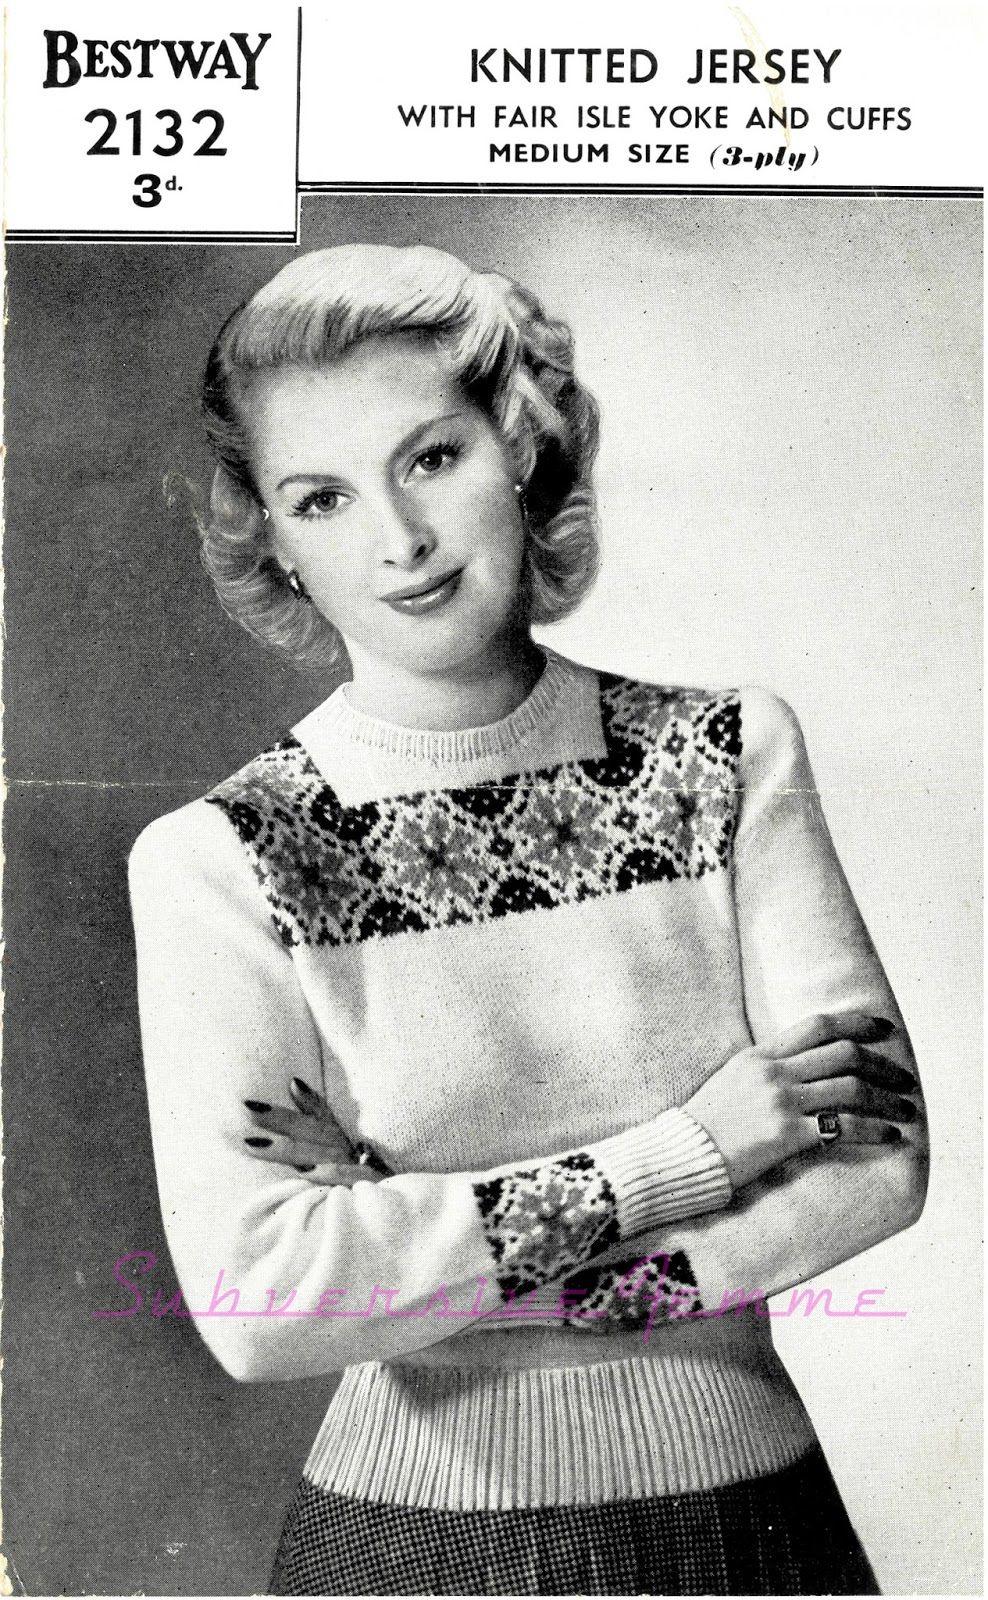 Subversive femme free vintage knitting pattern a fair isle subversive femme free vintage knitting pattern a fair isle jumper from bestway 2132 bankloansurffo Gallery